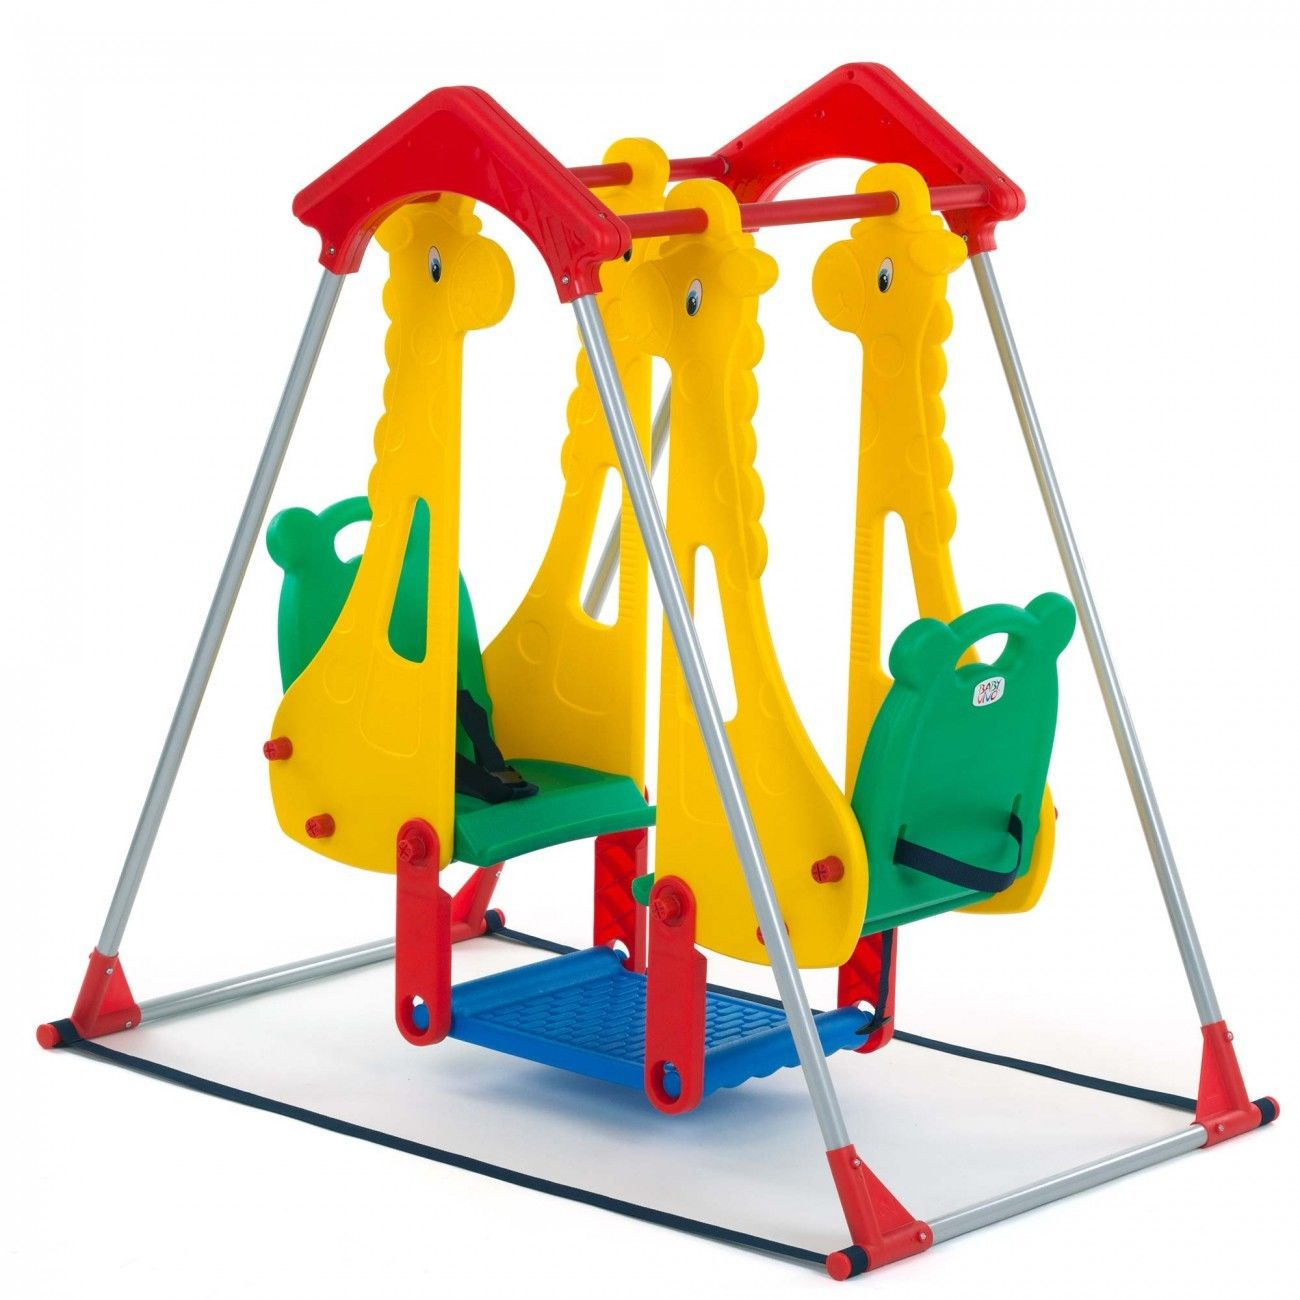 Kinderschaukel Spielplatzschaukel Gartenschaukel Doppelschaukel Schaukelgerüst